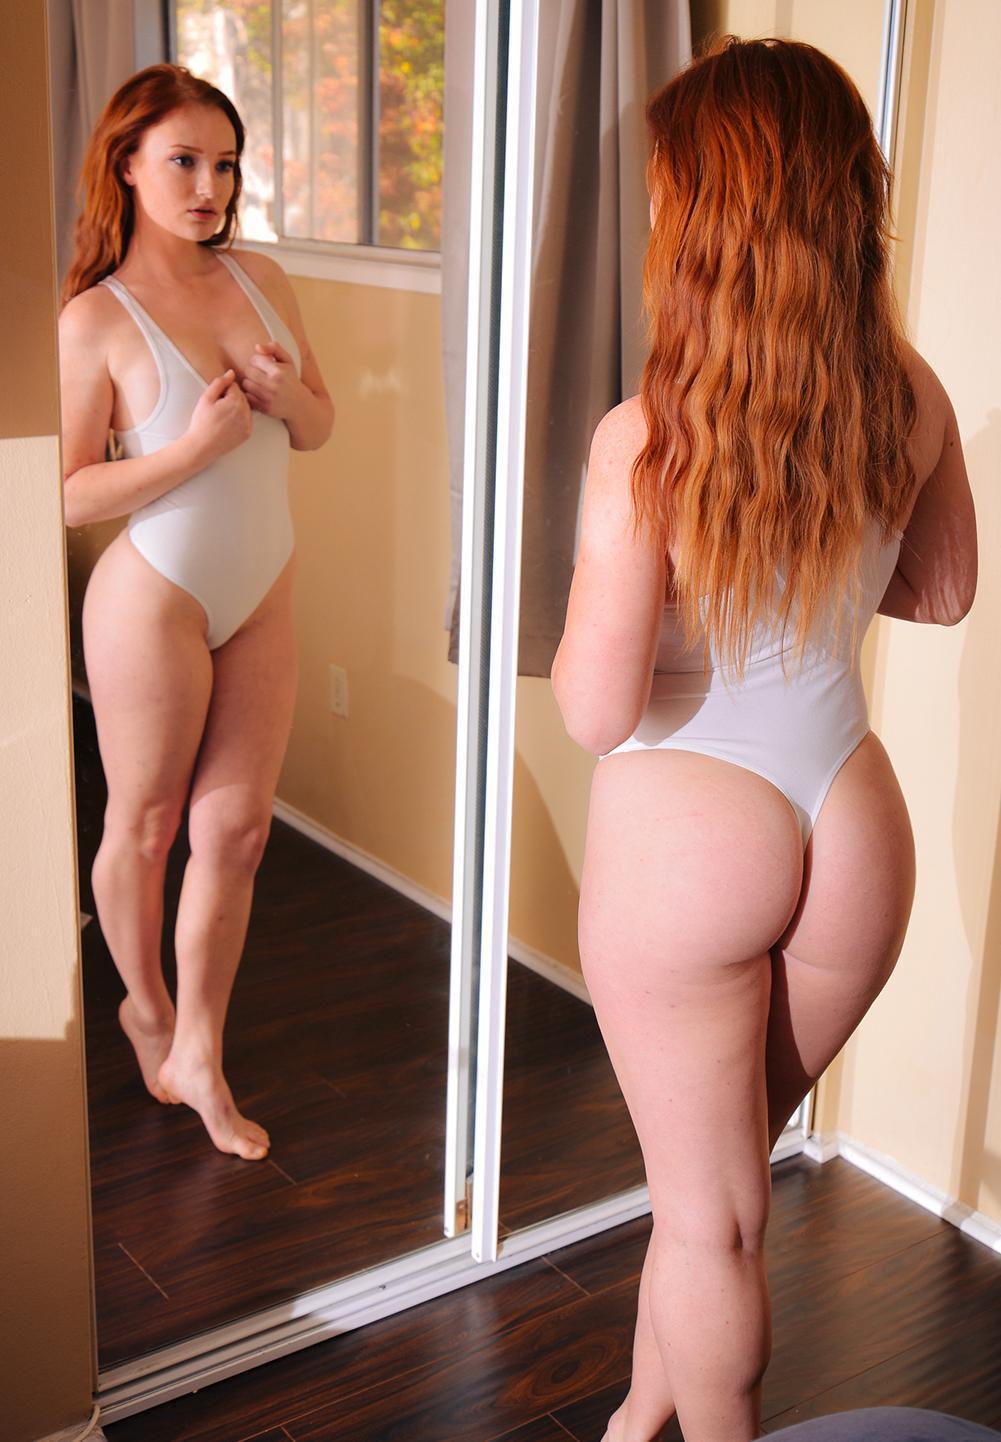 Free nude pics of lady gaga